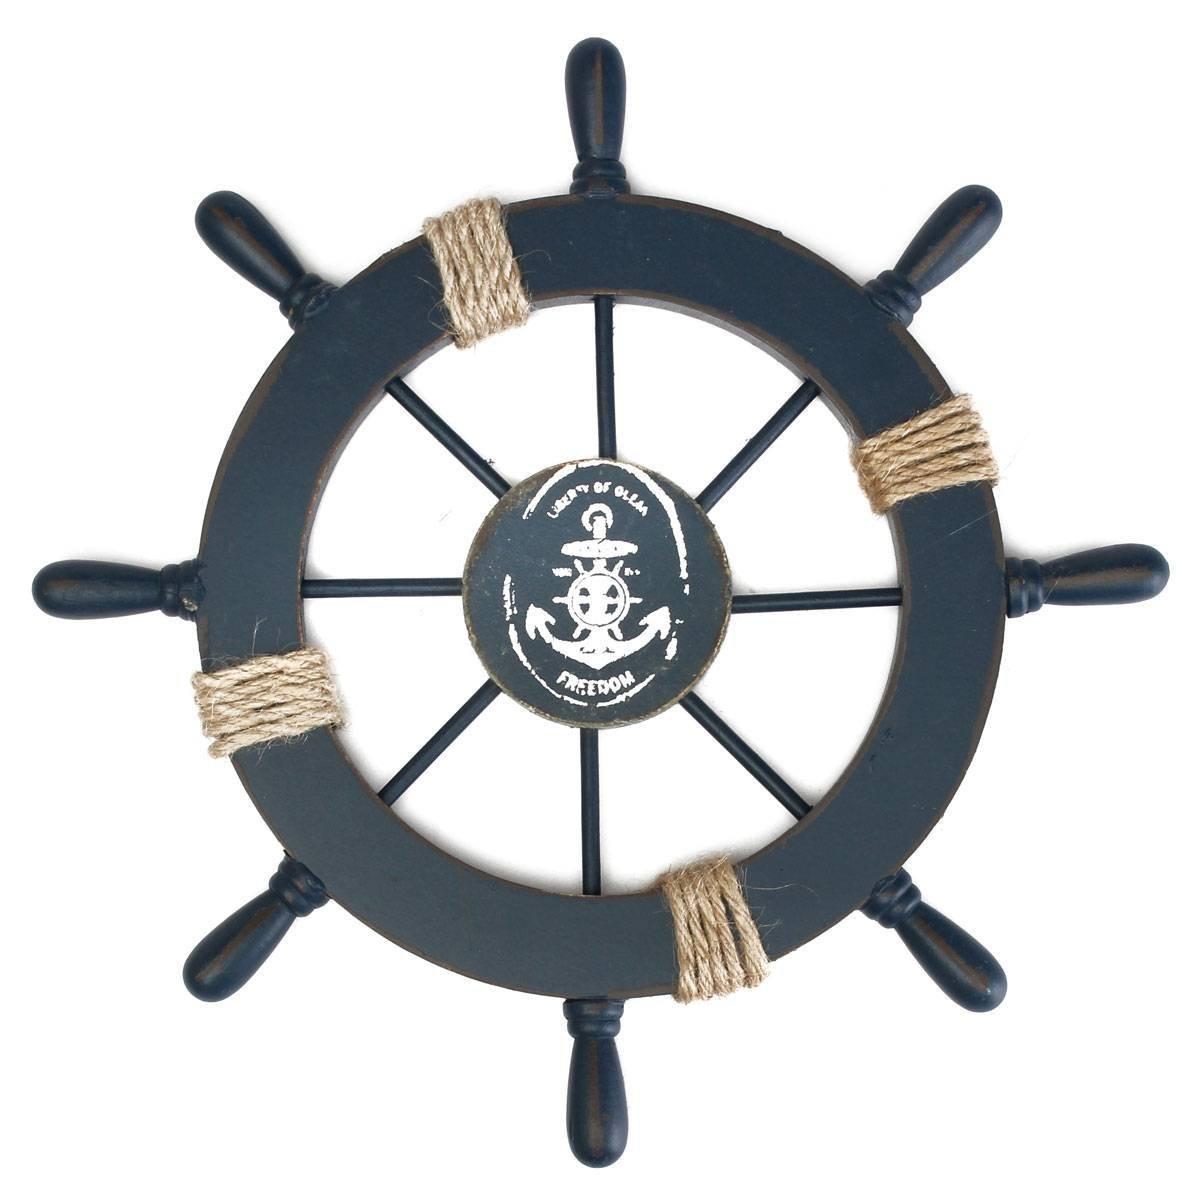 Mediterranean Nautical Wooden Boat Ship Wheel Helm Home Wall Party Decoration (Dark Blue)